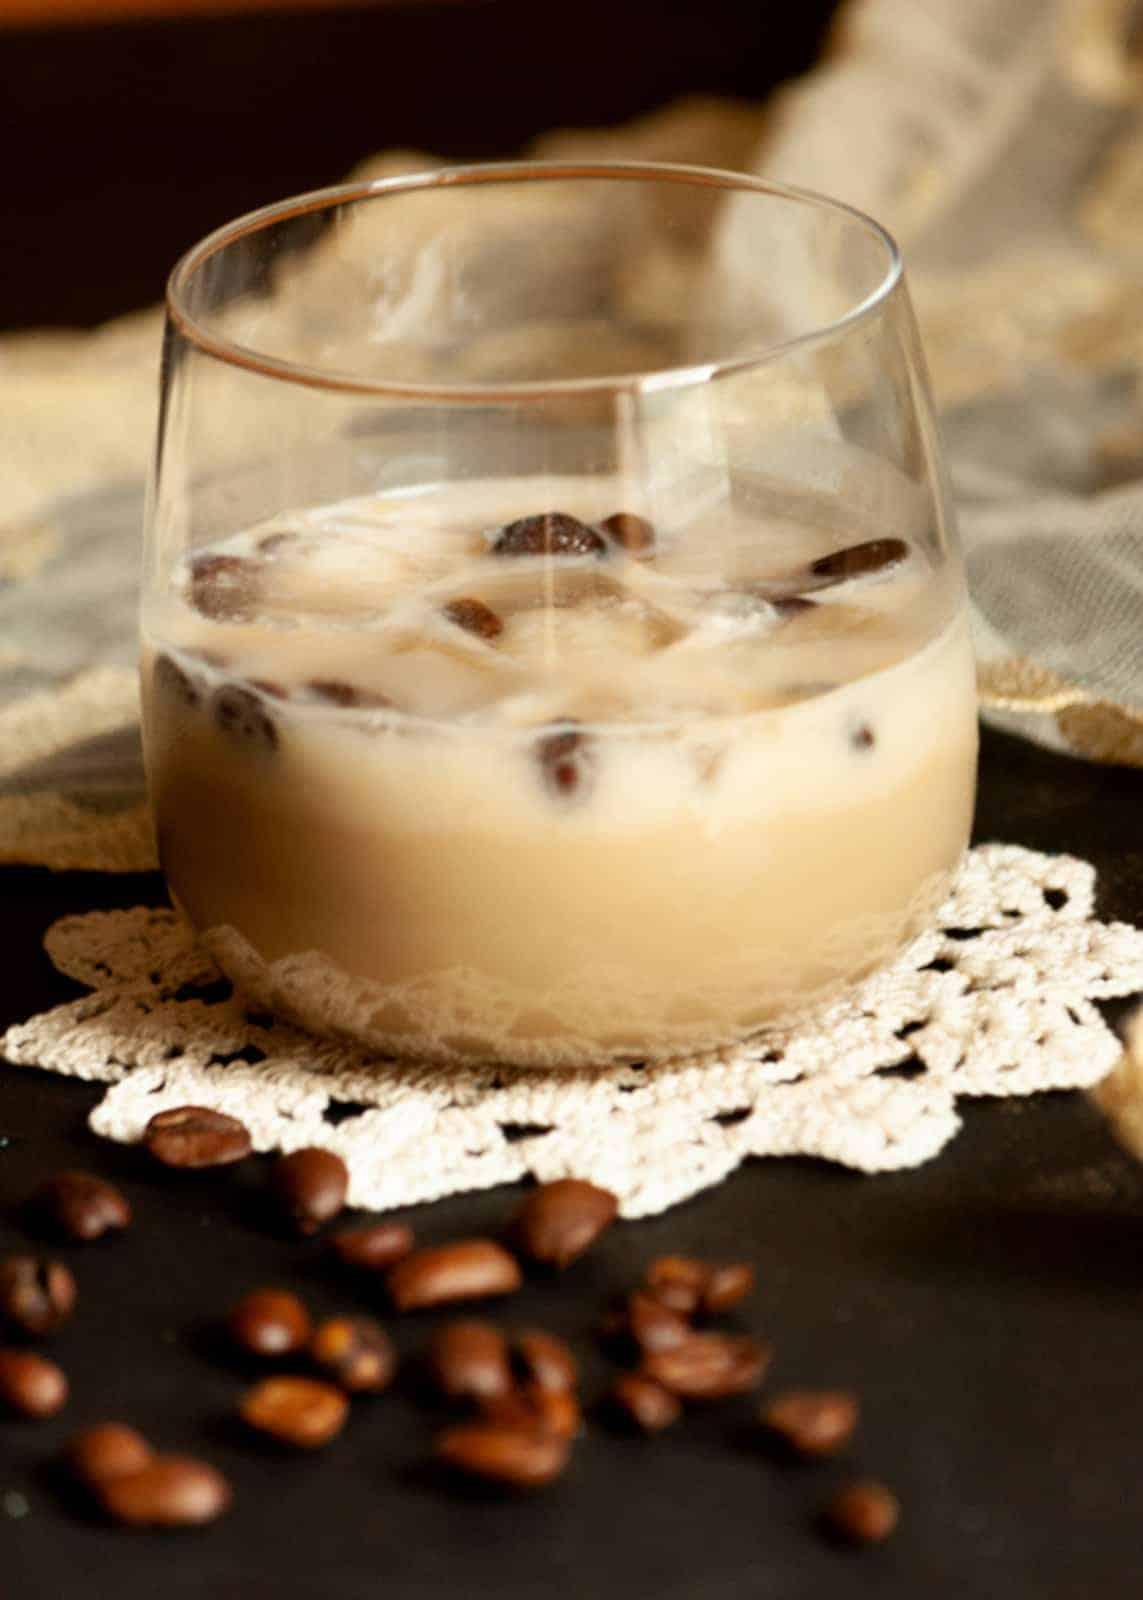 Cremiges Kaffee - Elixier